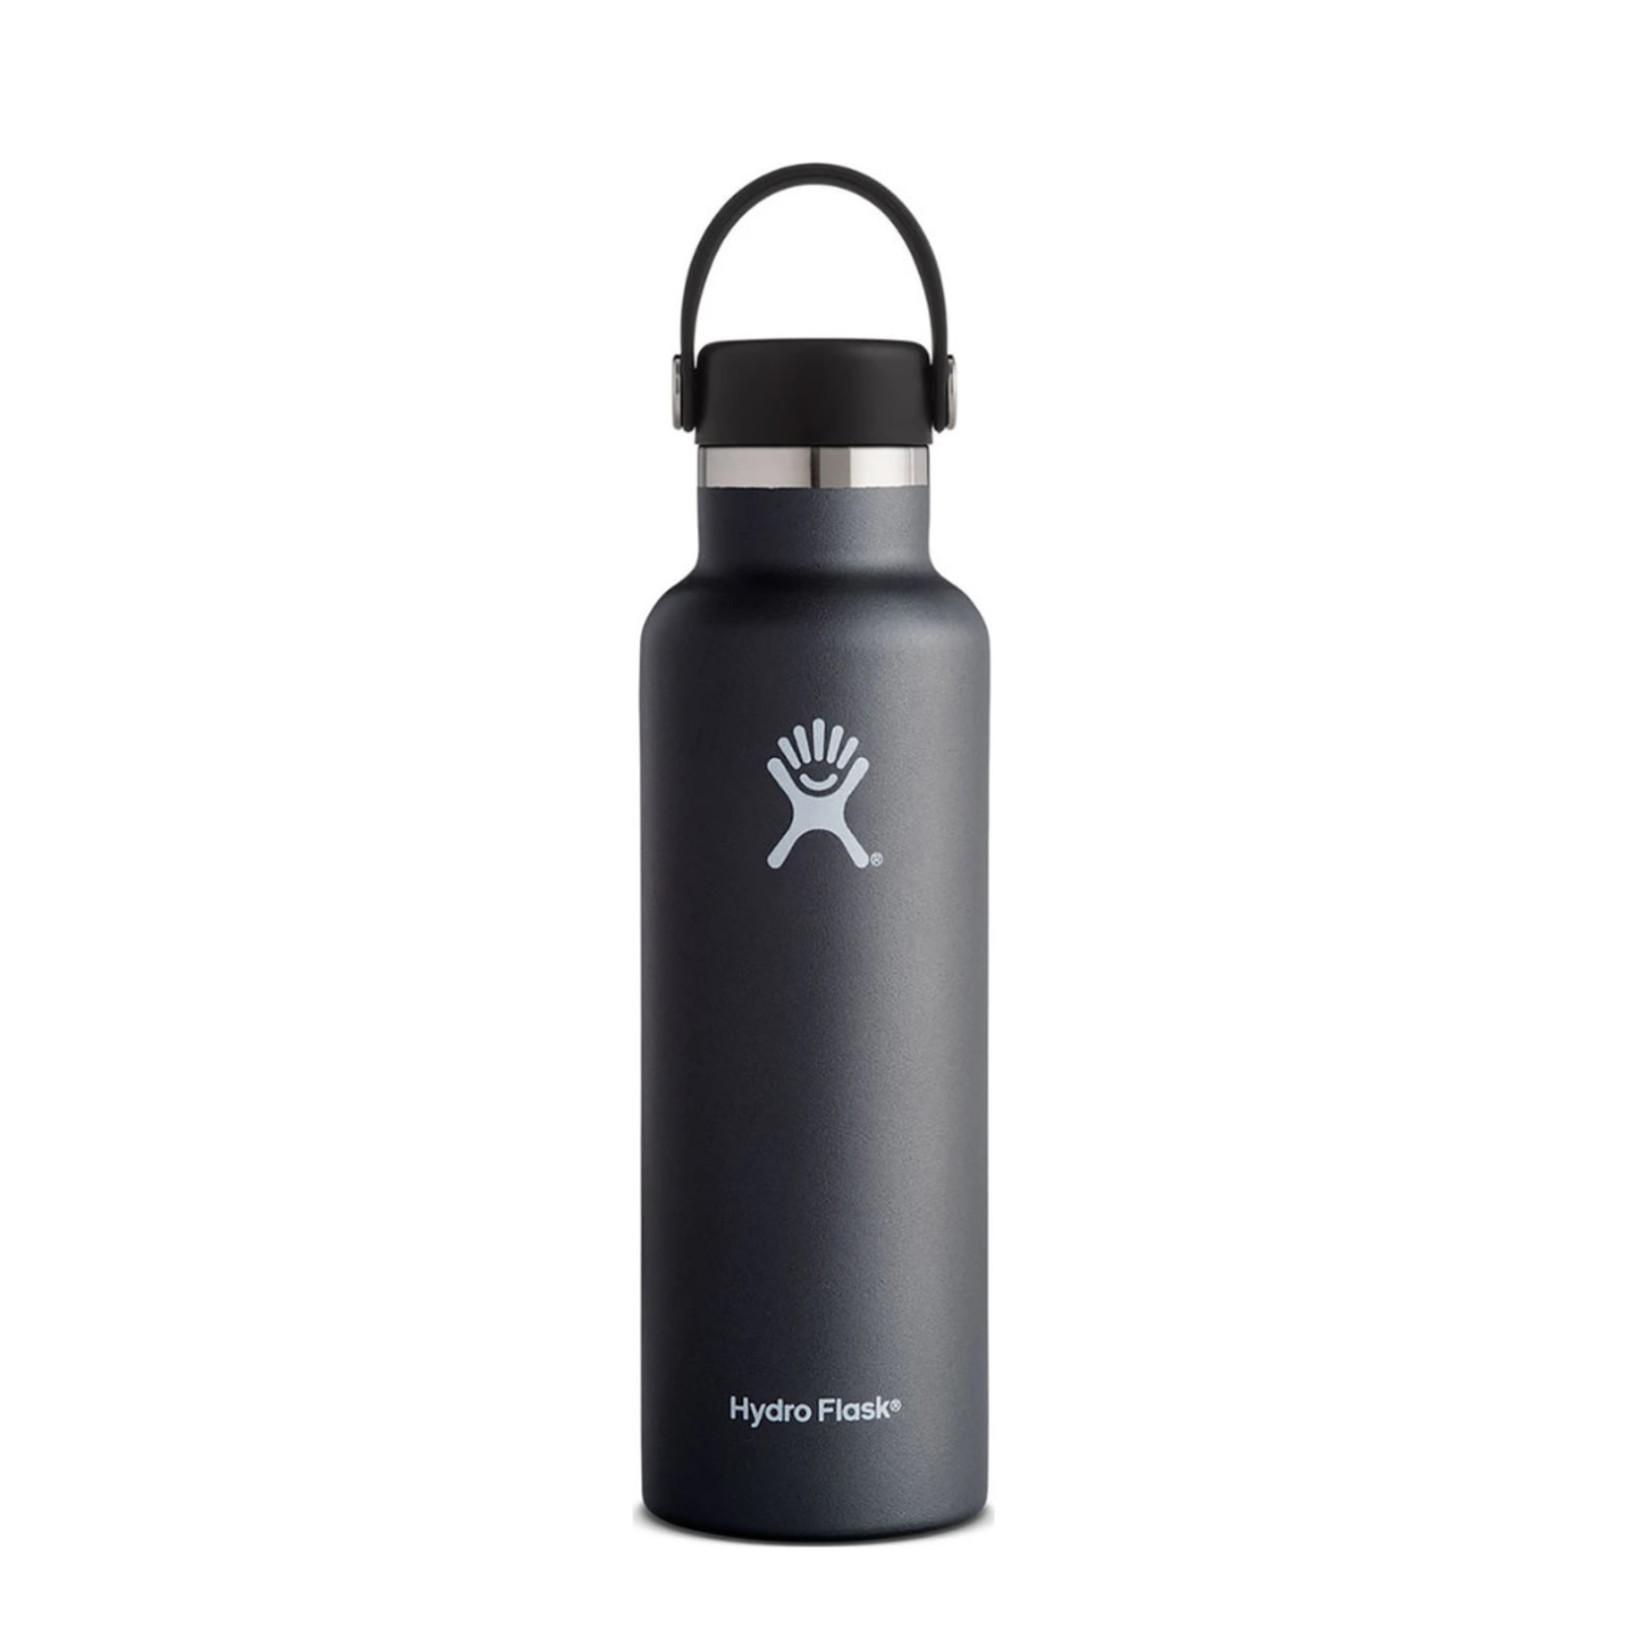 Hydro Flask Hydro Flask 18 oz. Standard Mouth w/ Flex Cap - Black